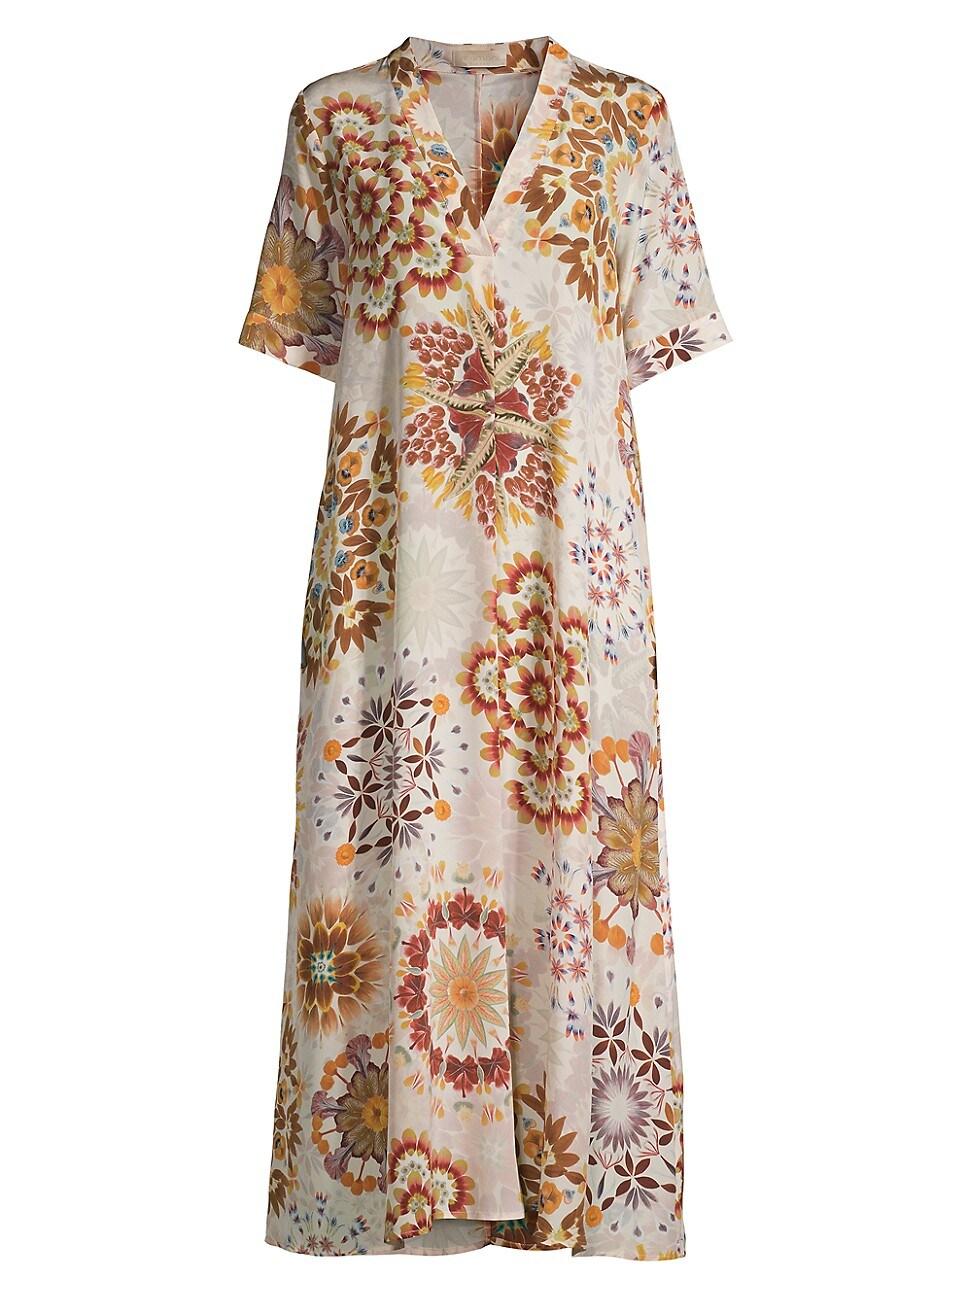 Momoní WOMEN'S ALTAMURA MAXI TUNIC DRESS